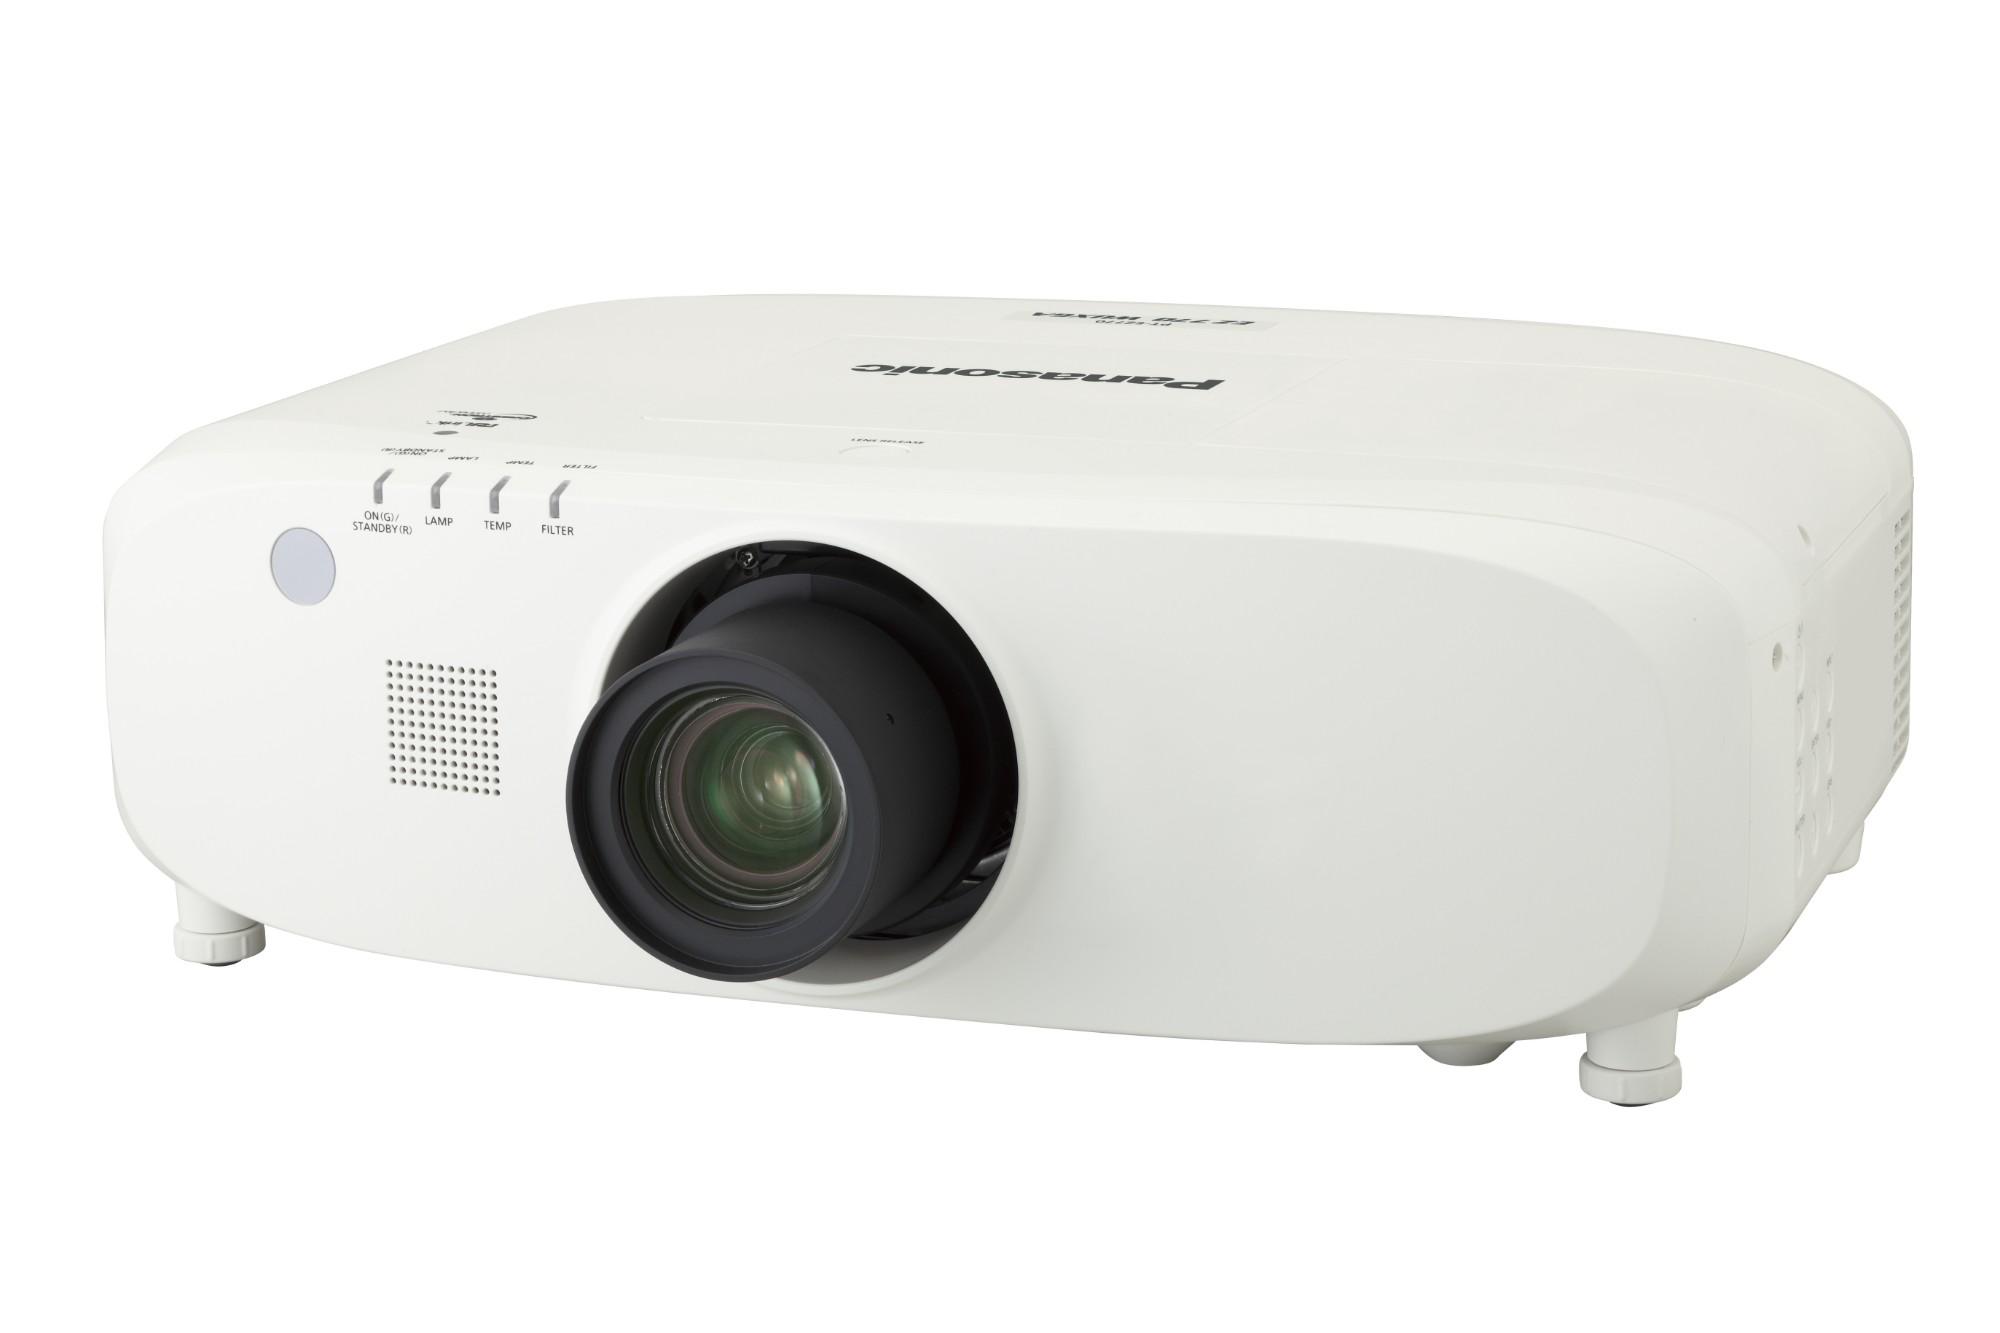 Panasonic PT-EX800Z data projector 7500 ANSI lumens LCD XGA (1024x768) Desktop projector White